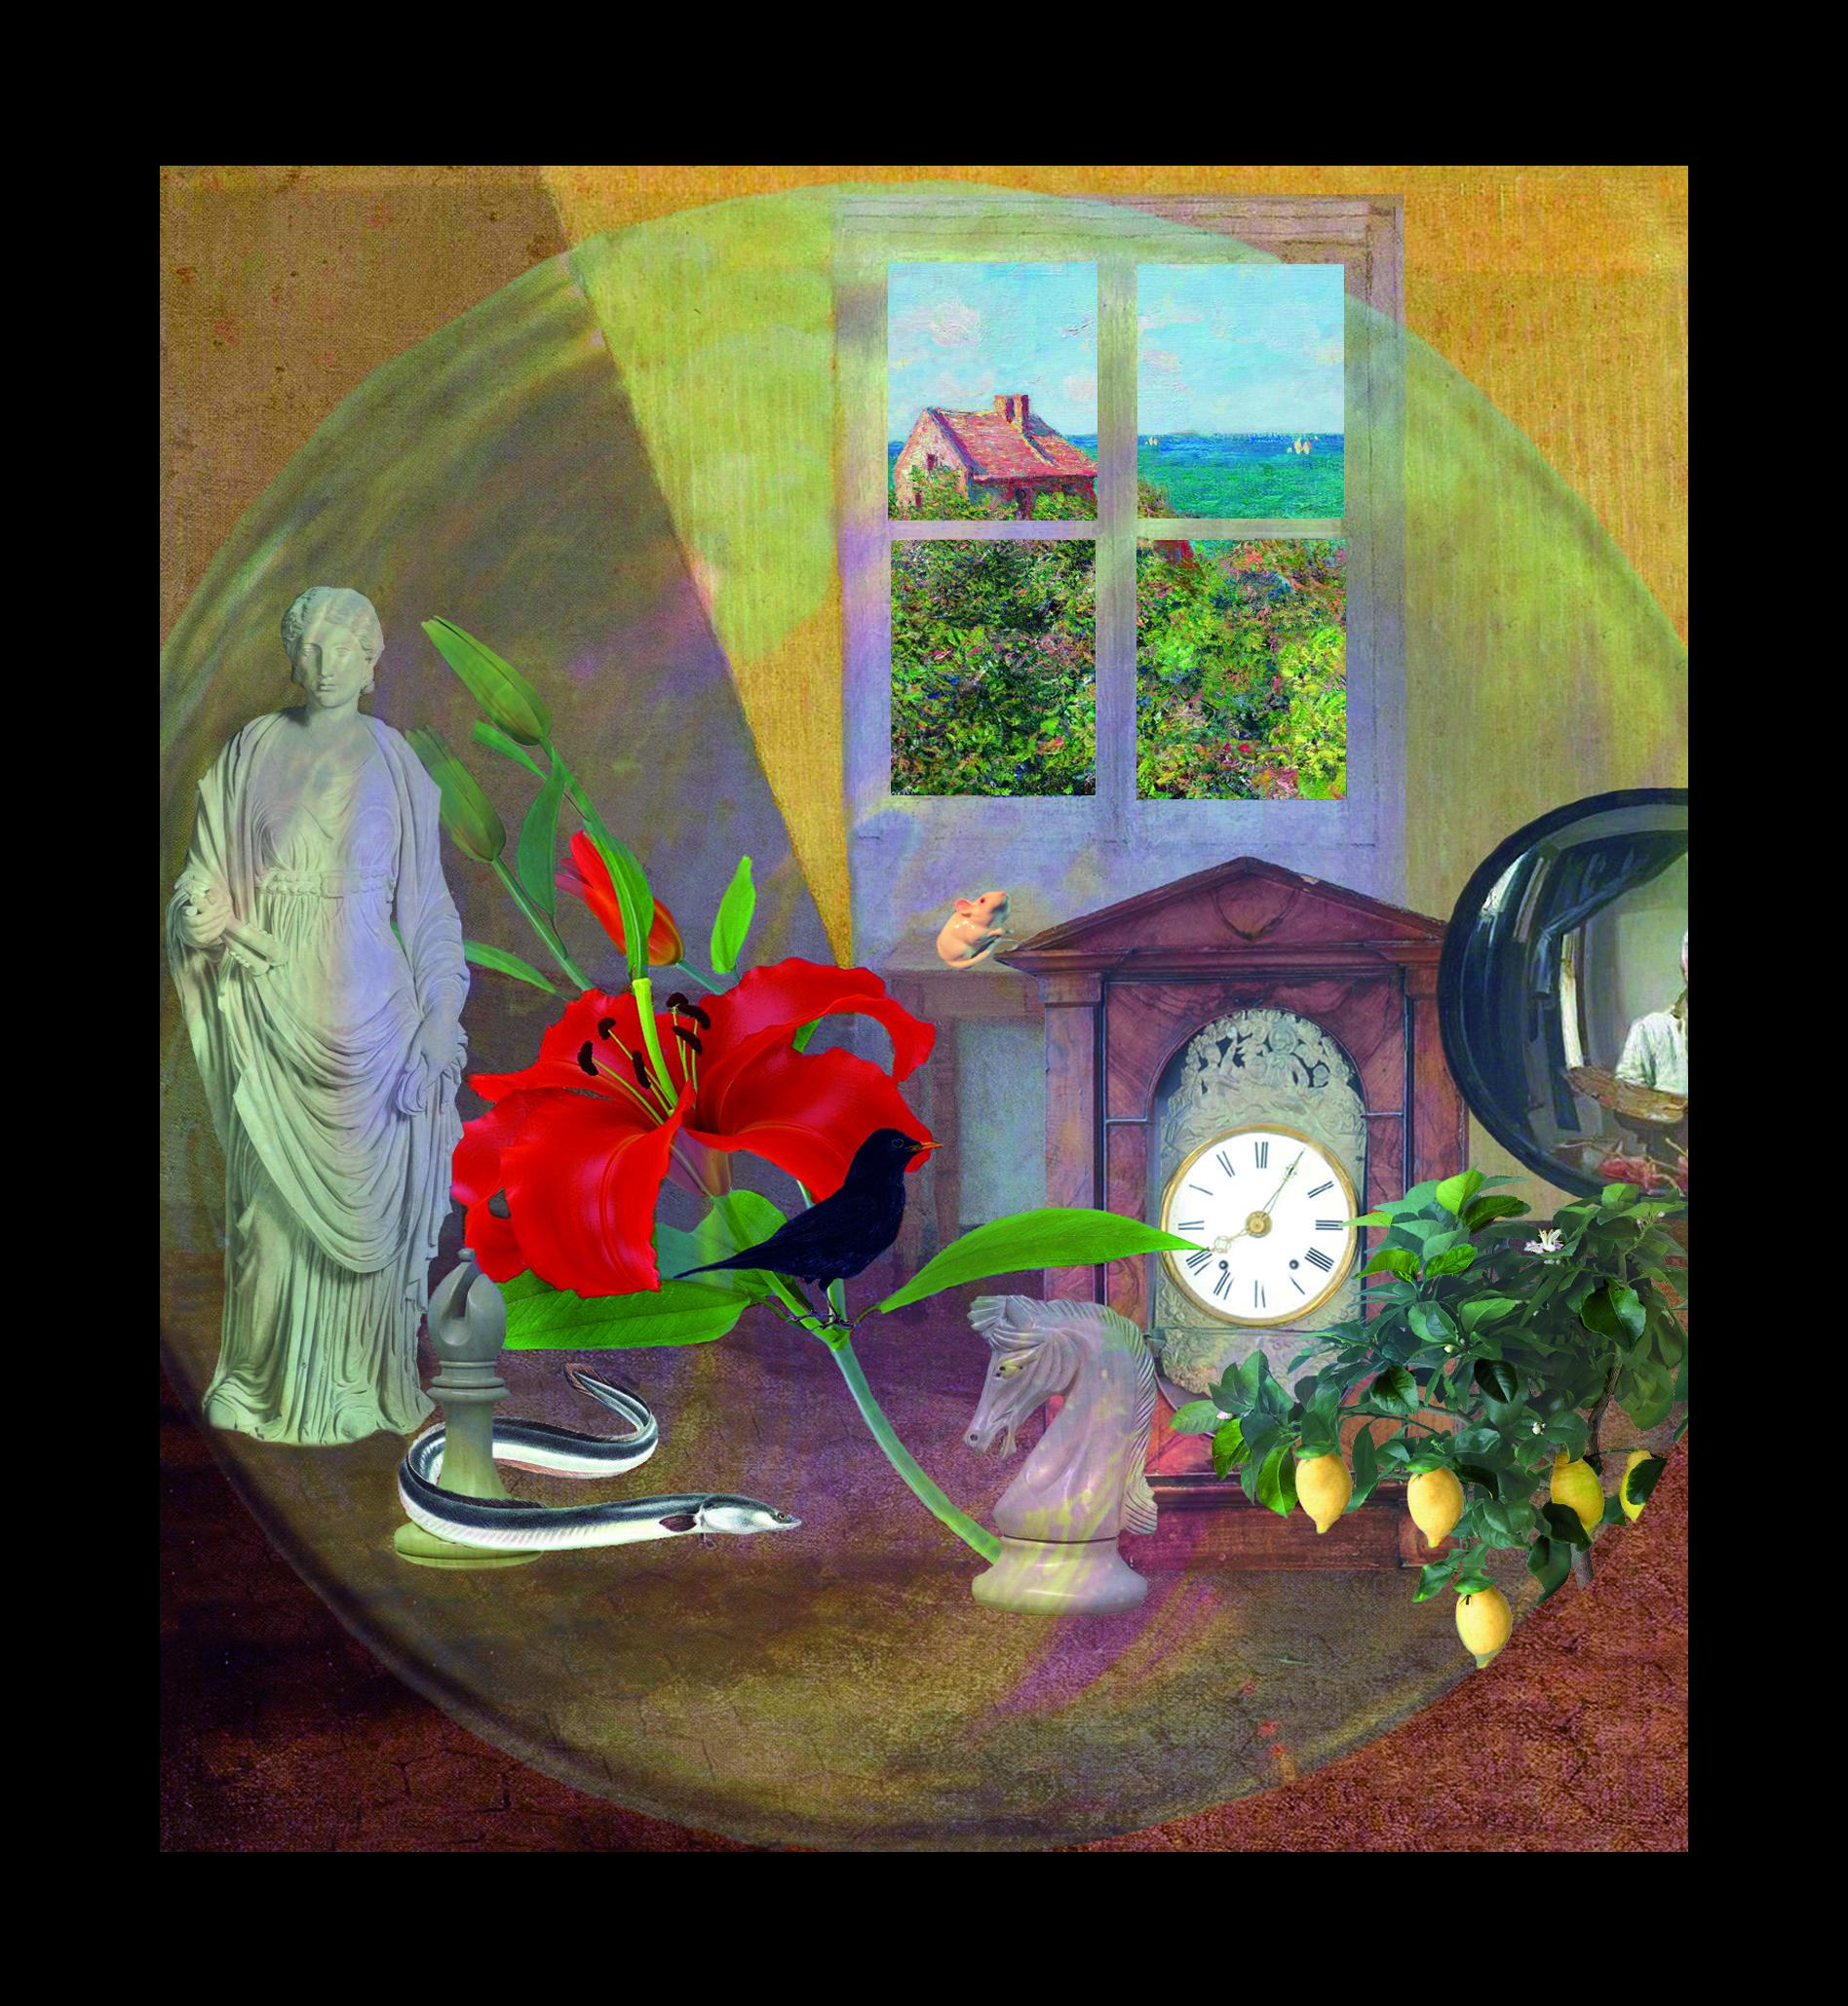 Eugenio Montale - Elegia - Teatrino 3D  Collage in scatola di ayous, tecnica mista, 24,5 x 26,5 x 8